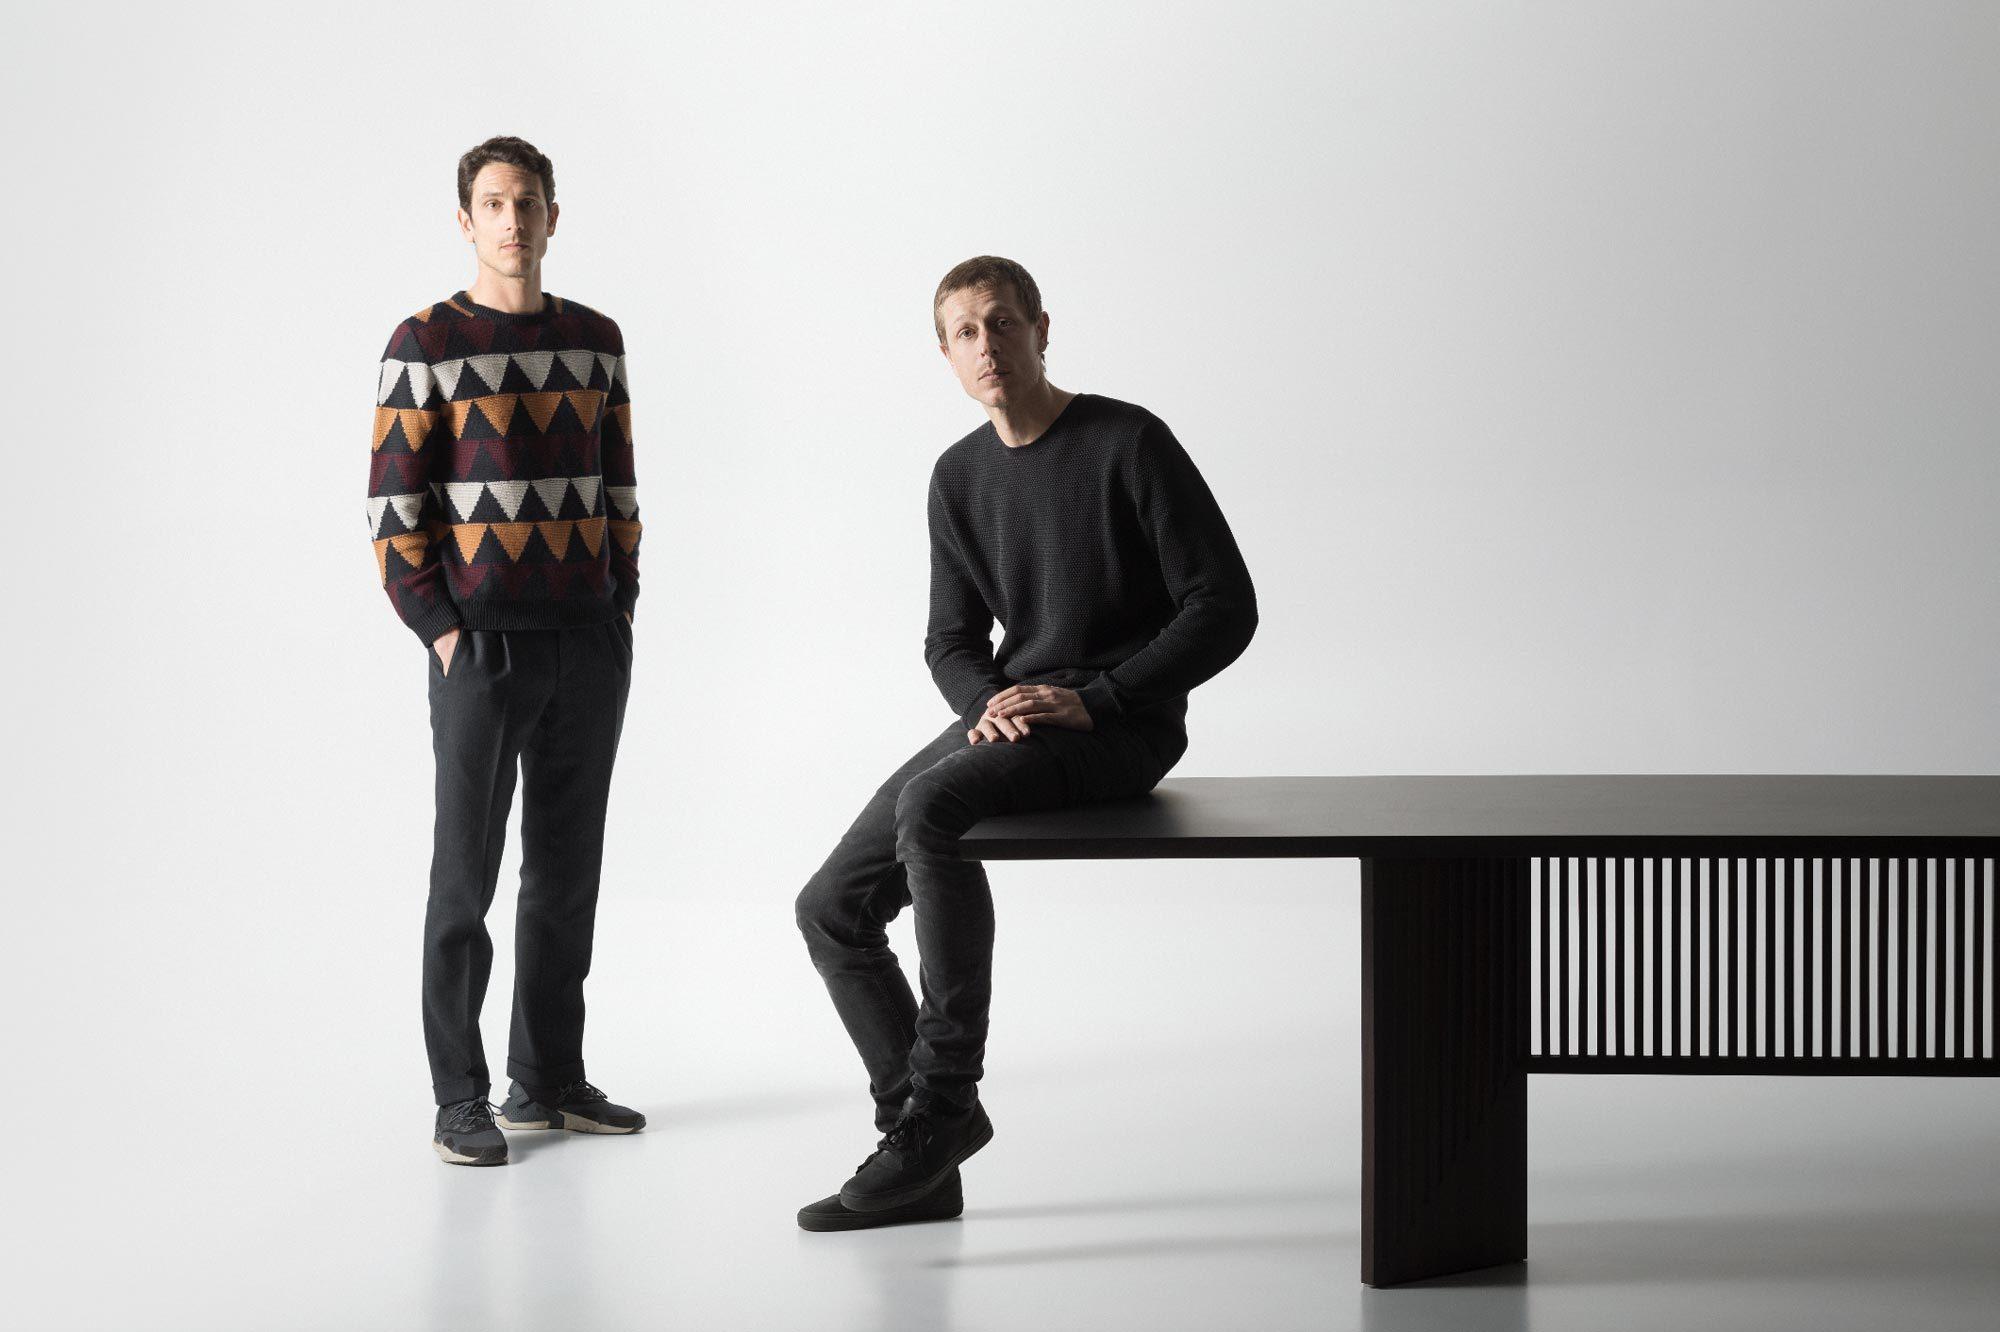 Francesco Meda und David Lopez Quincoces neue Kreativdirektoren